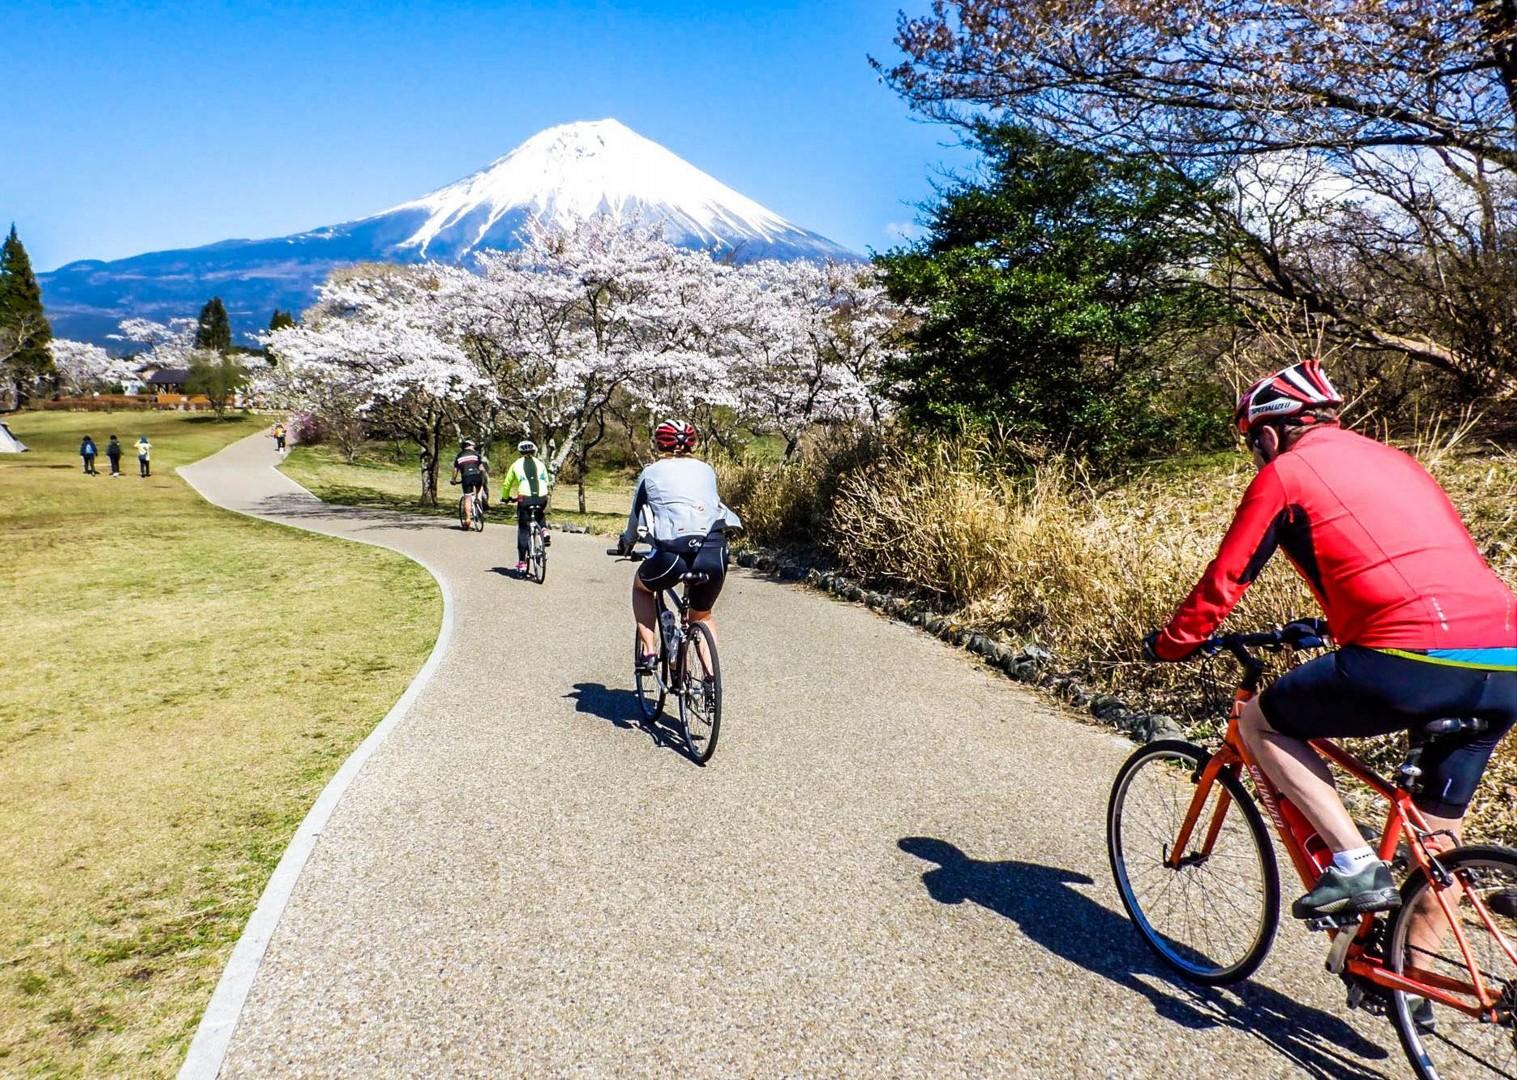 taka_15_apr_DSCF1326.jpg - Japan - Classic Japan - Fuji to Kyoto - Cycling Holiday - Cycling Adventures